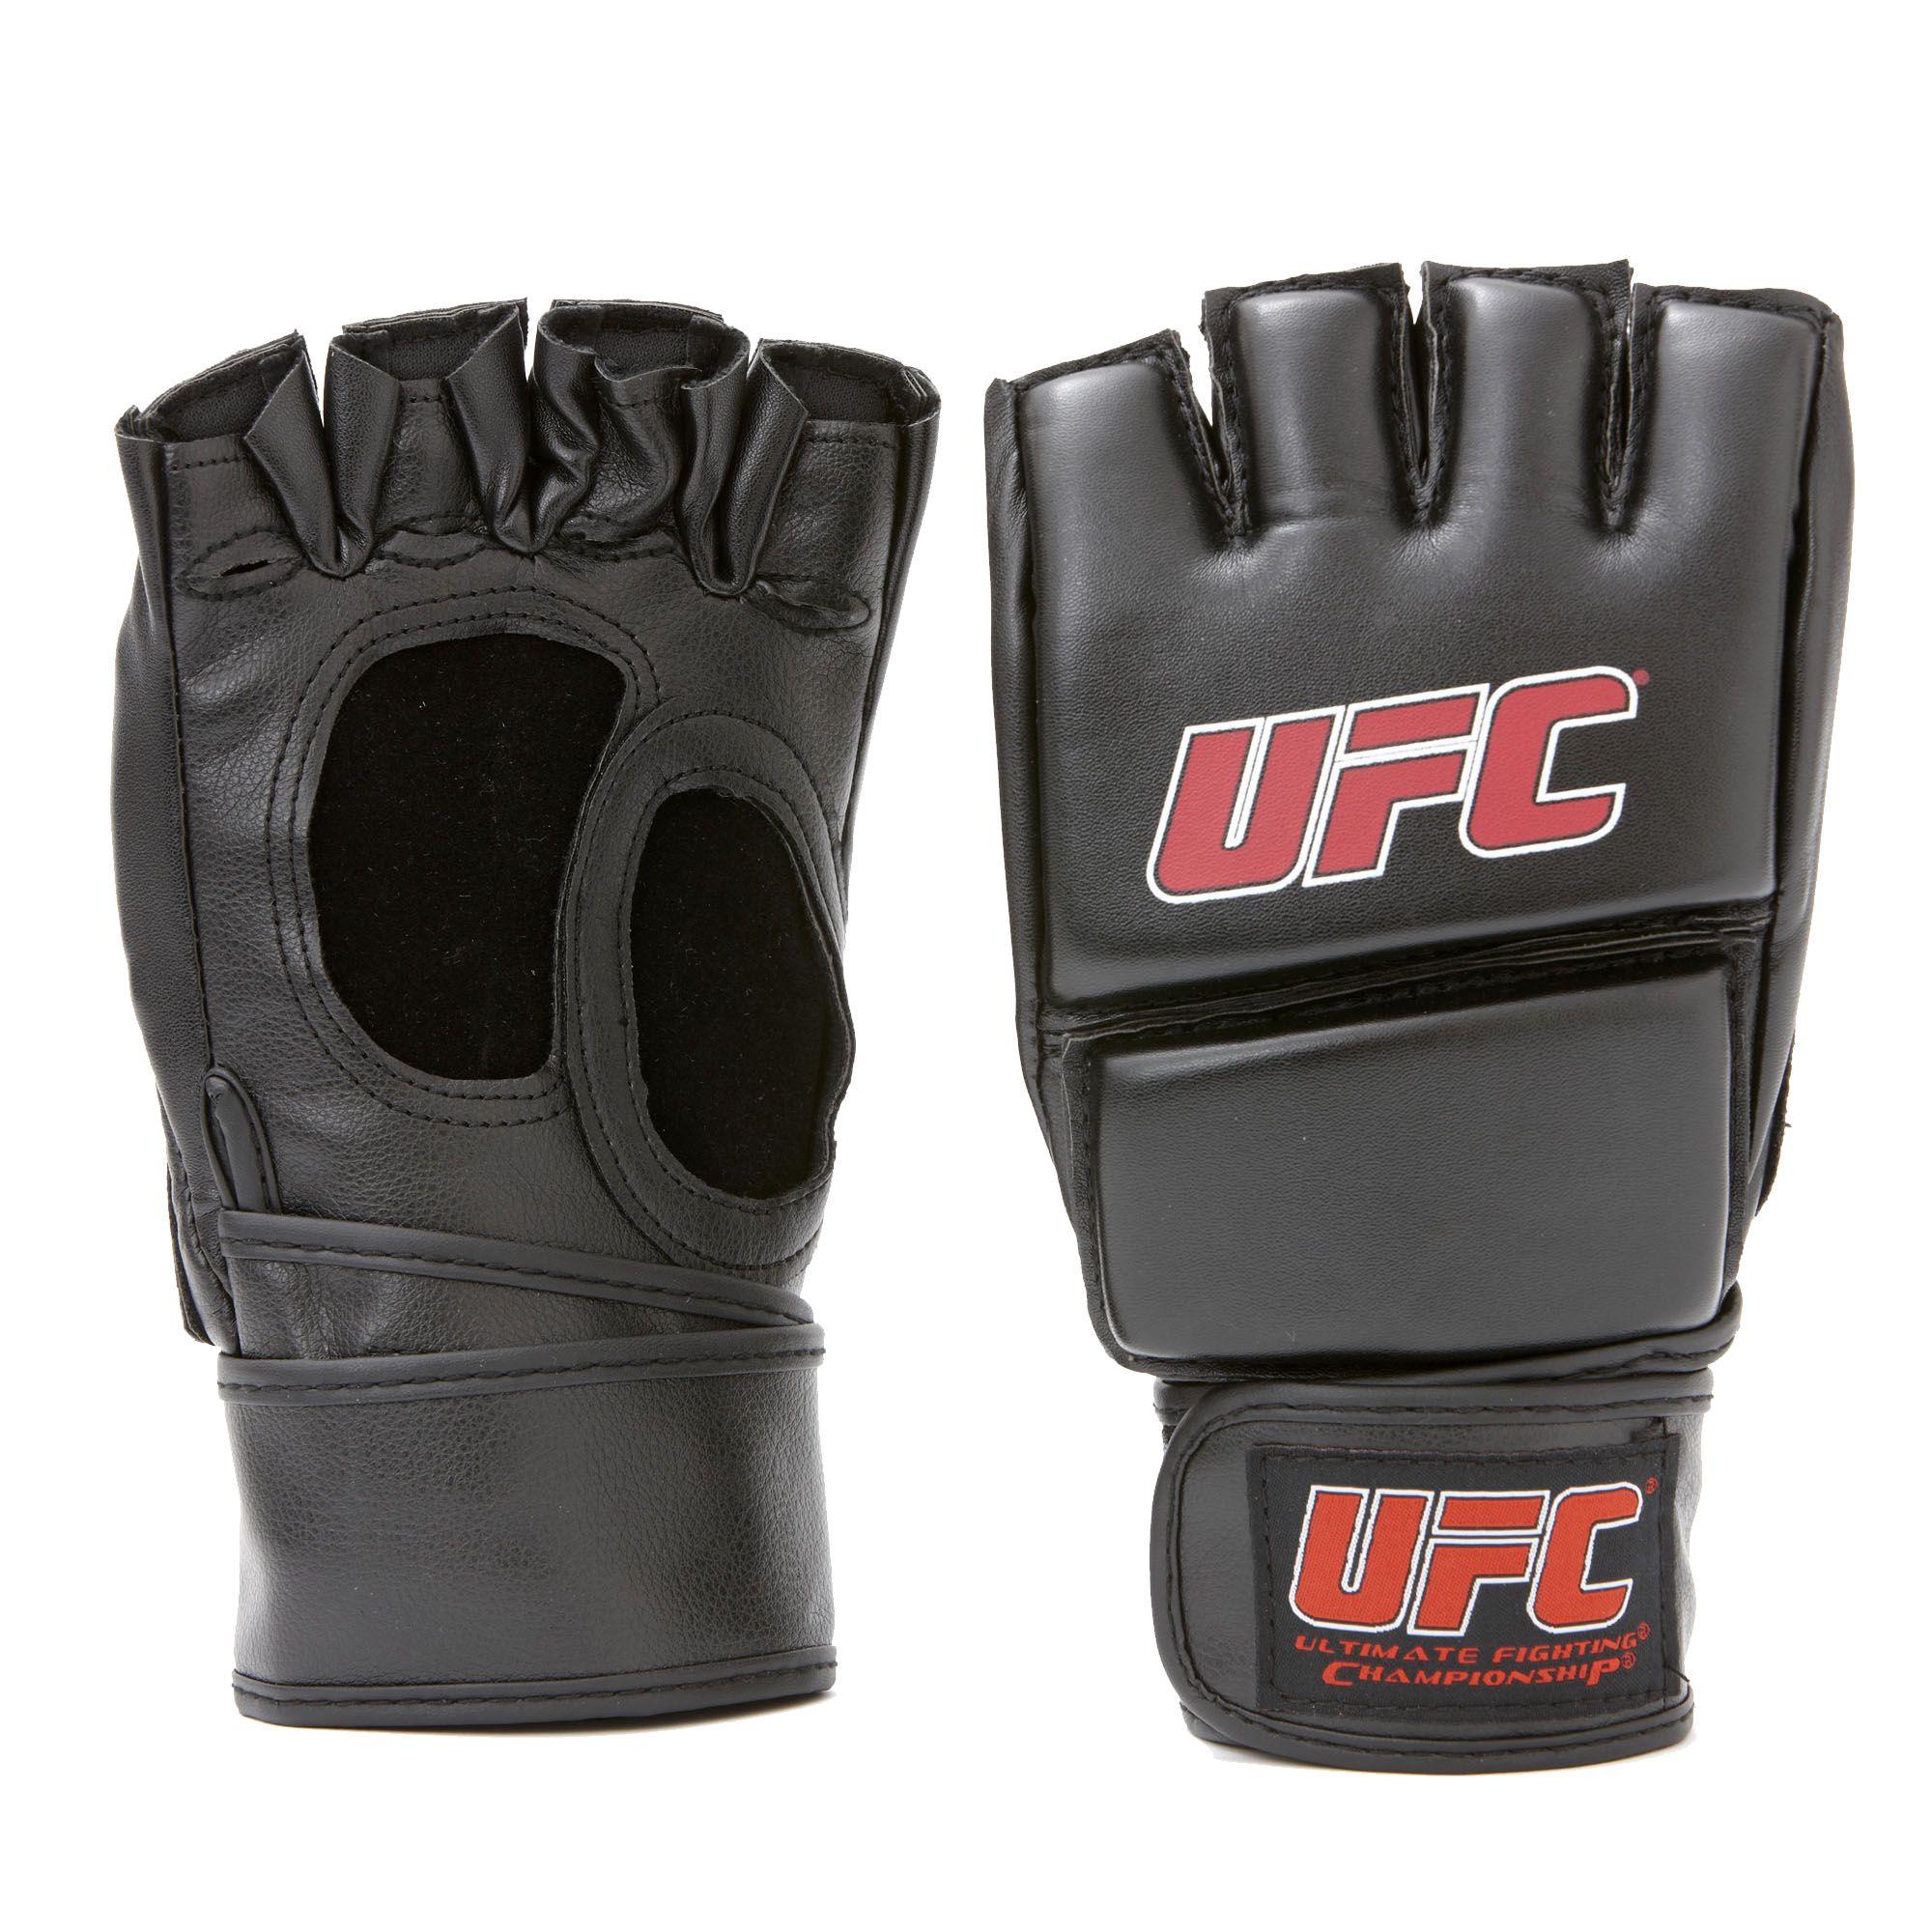 Ufc Mma Training Gloves Sweatband Com